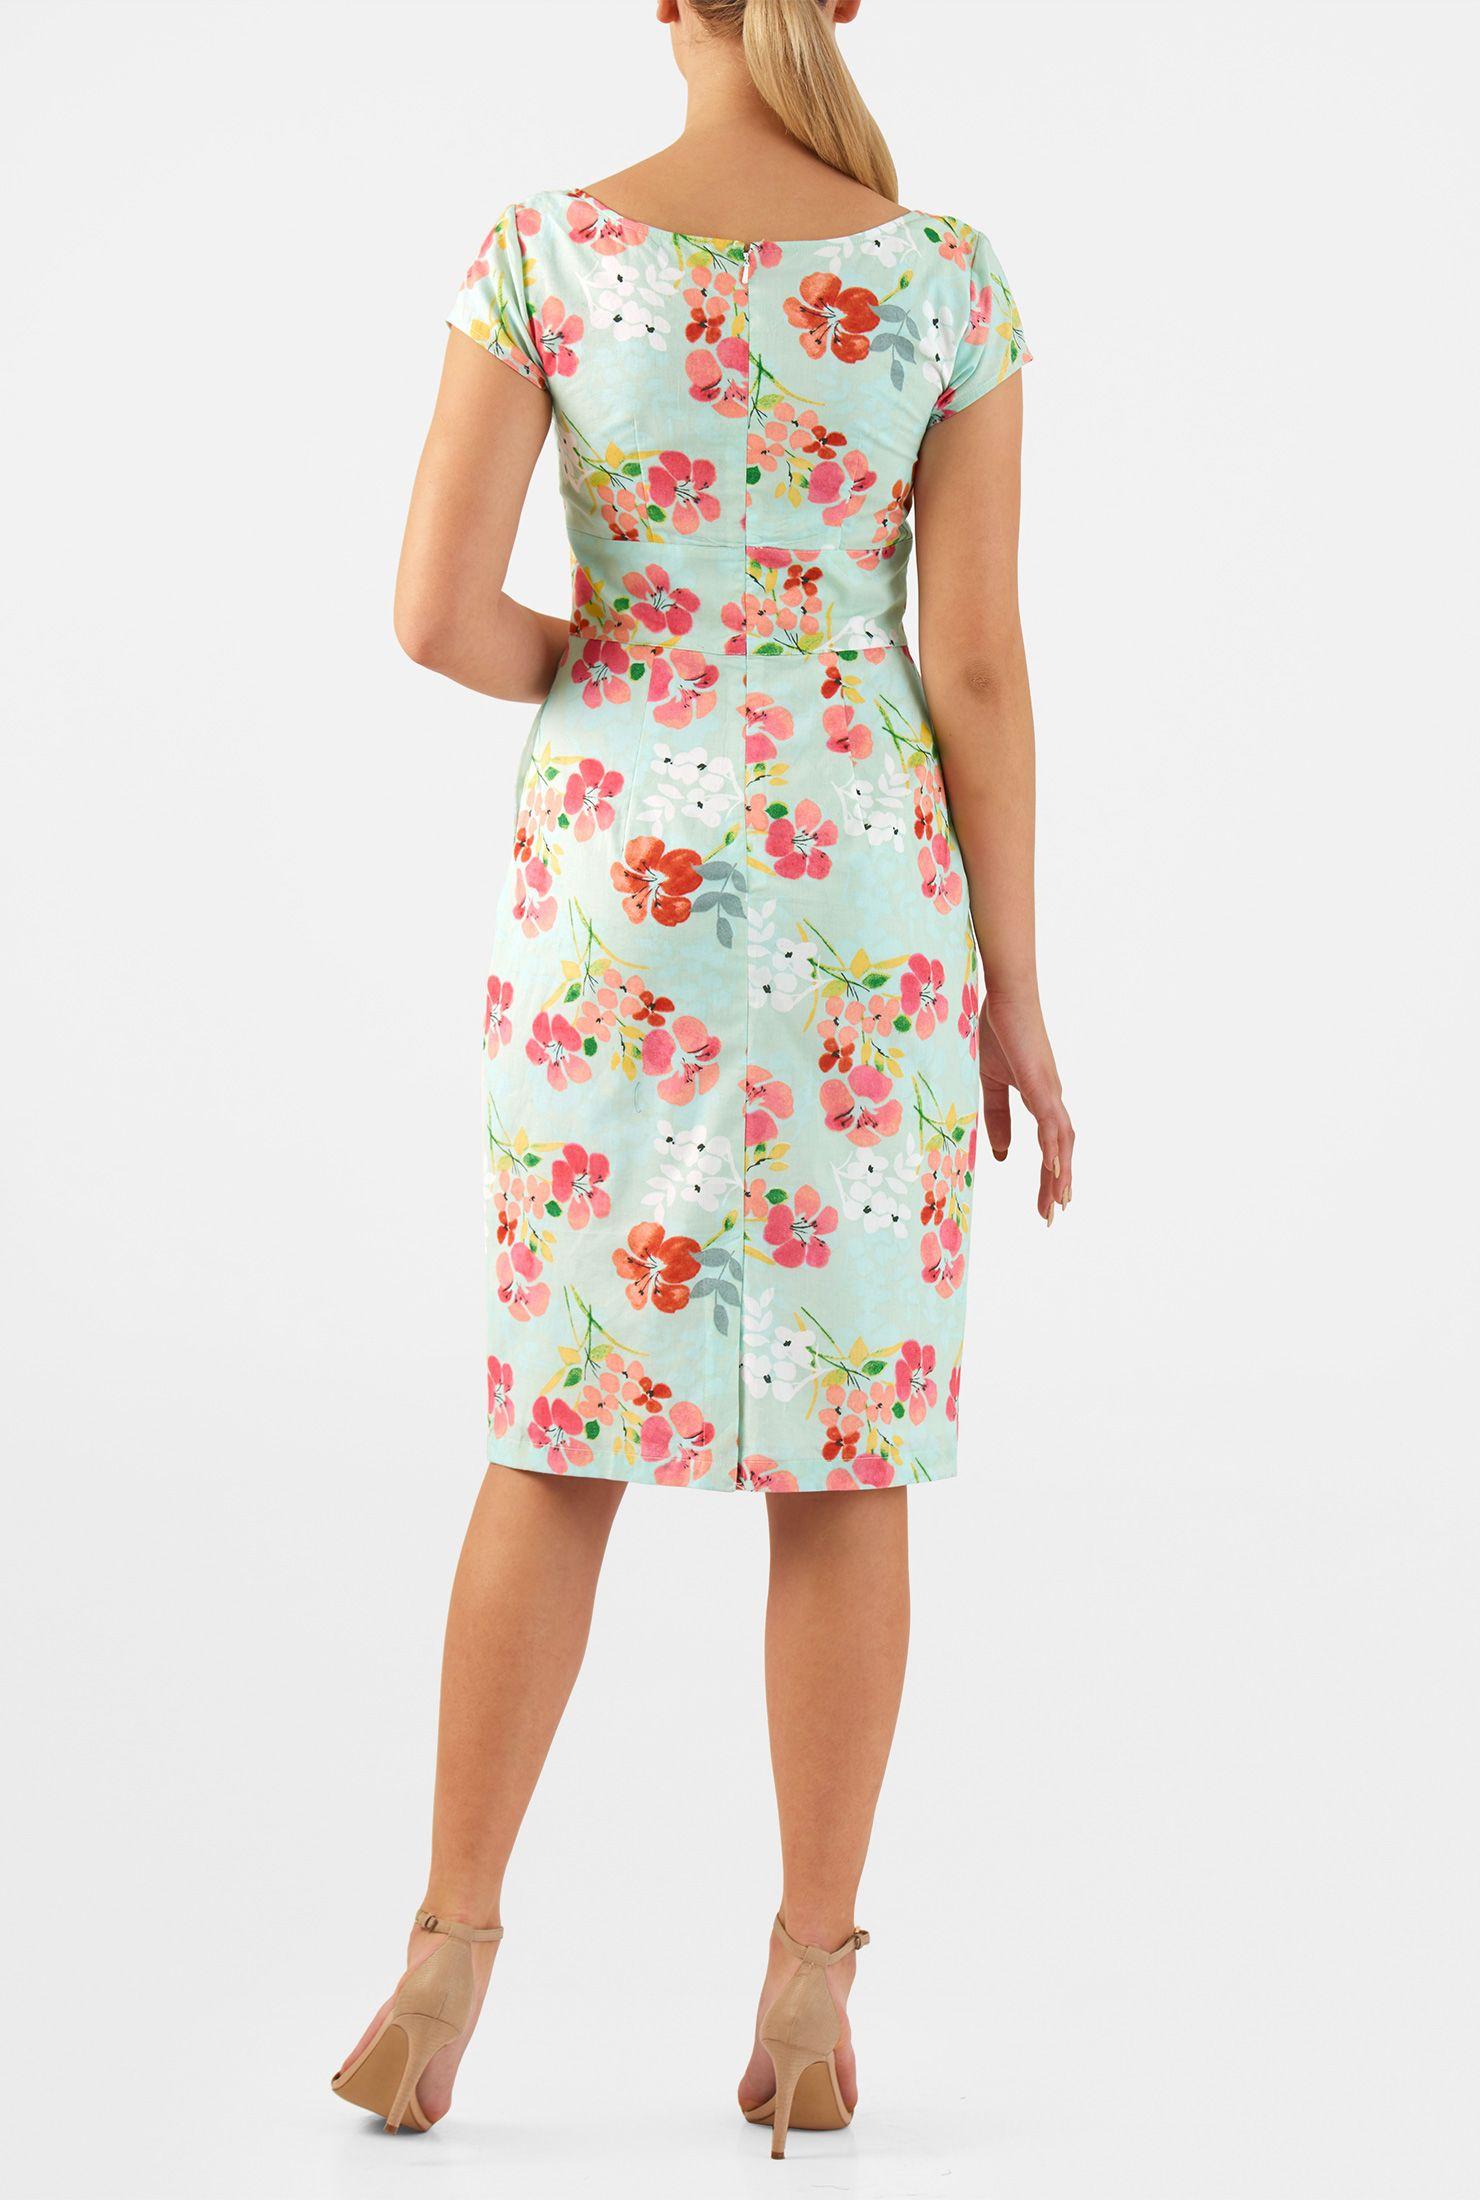 Washed floral cotton print sheath dress pinterest daytime